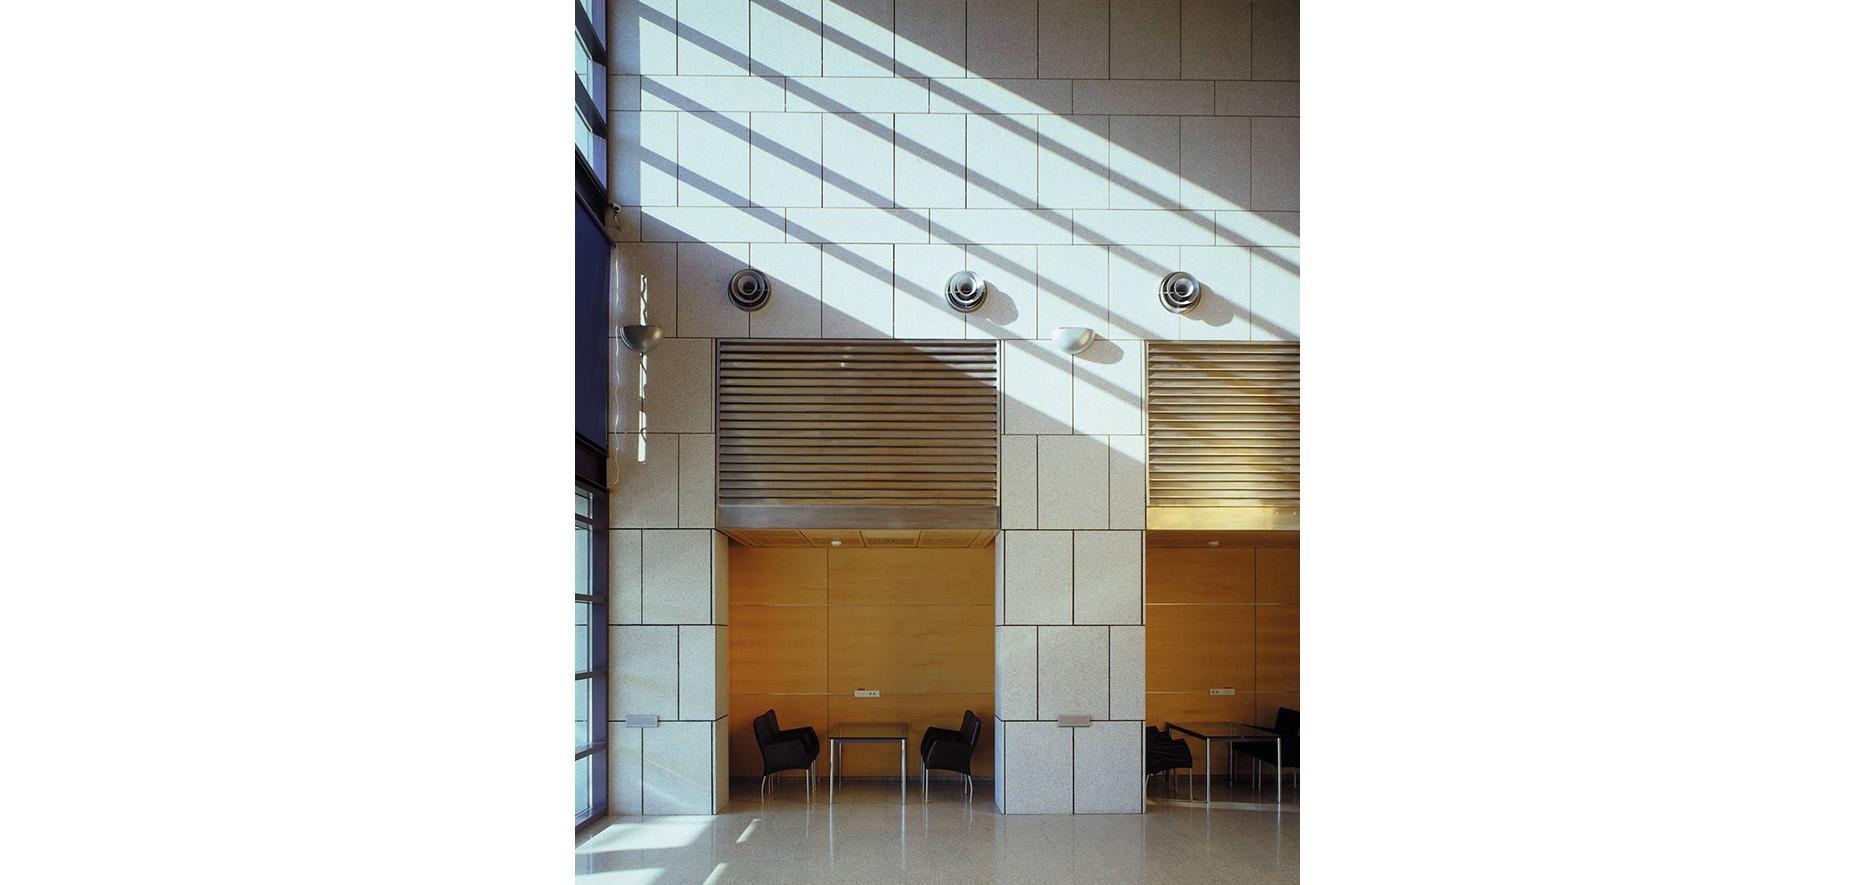 Binyan_Applied_materials_by_KolkerEpstein_Architects005